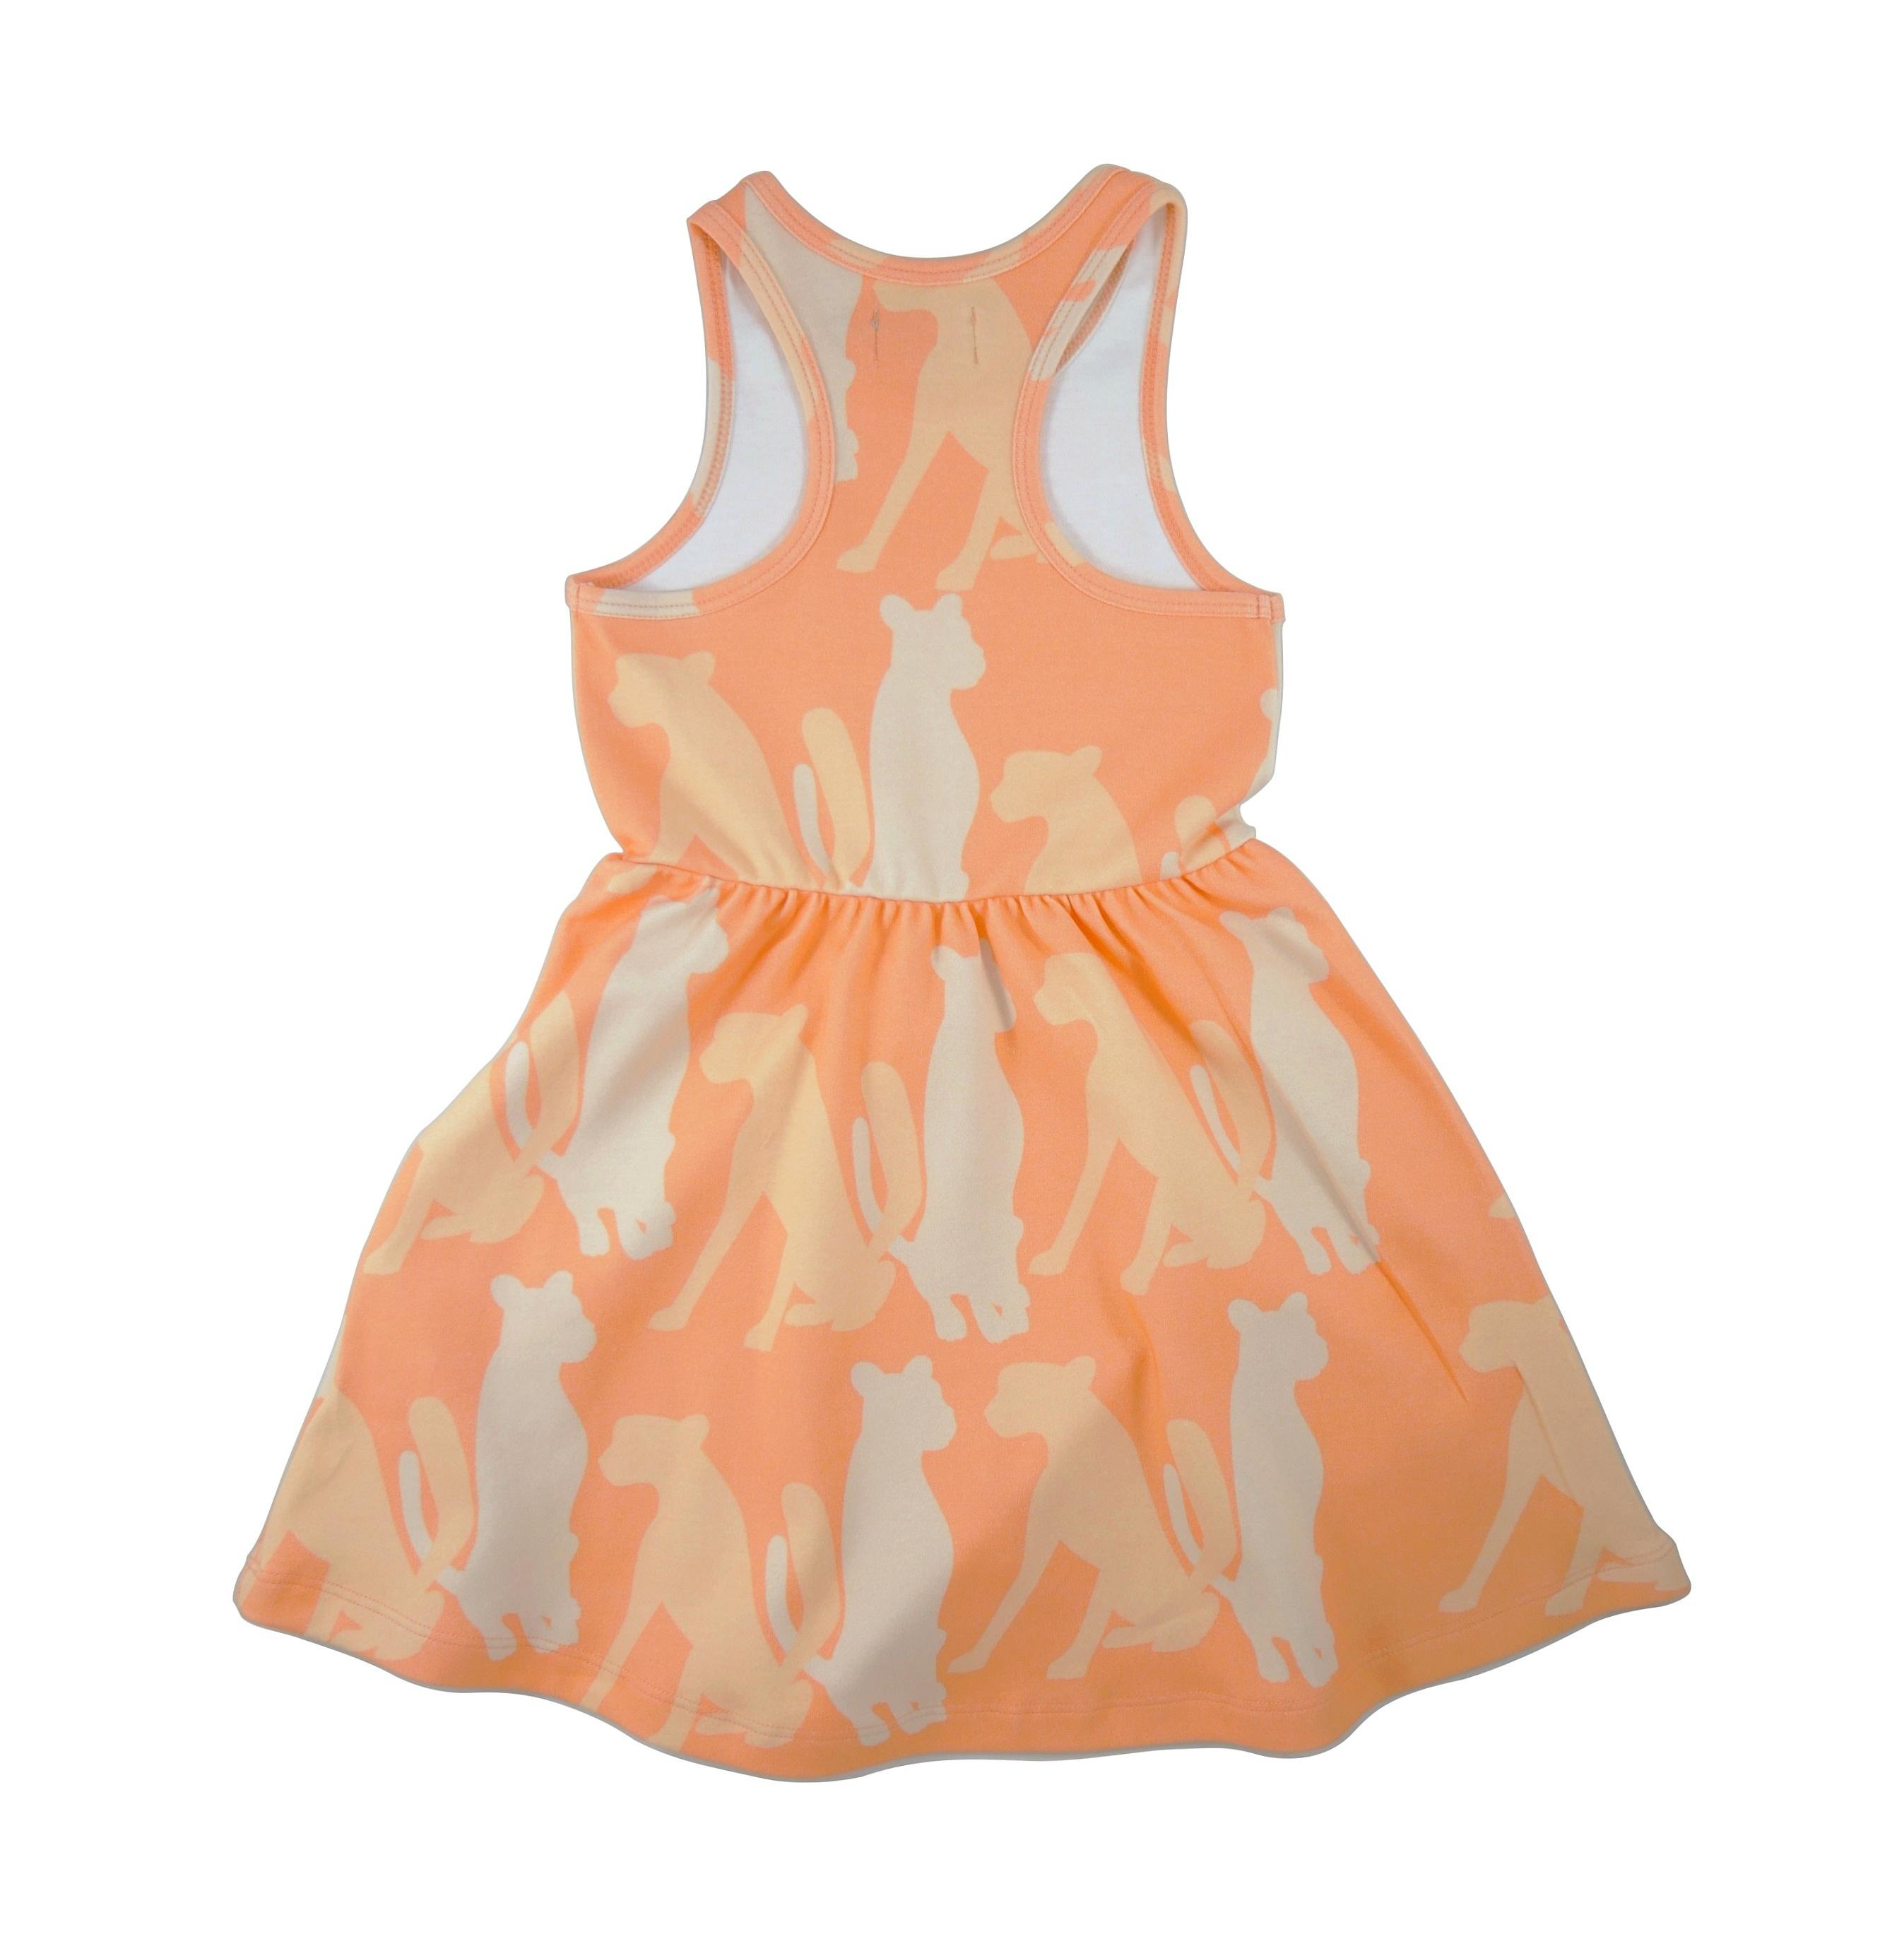 19SSDC Dress Cheetha Silouette back